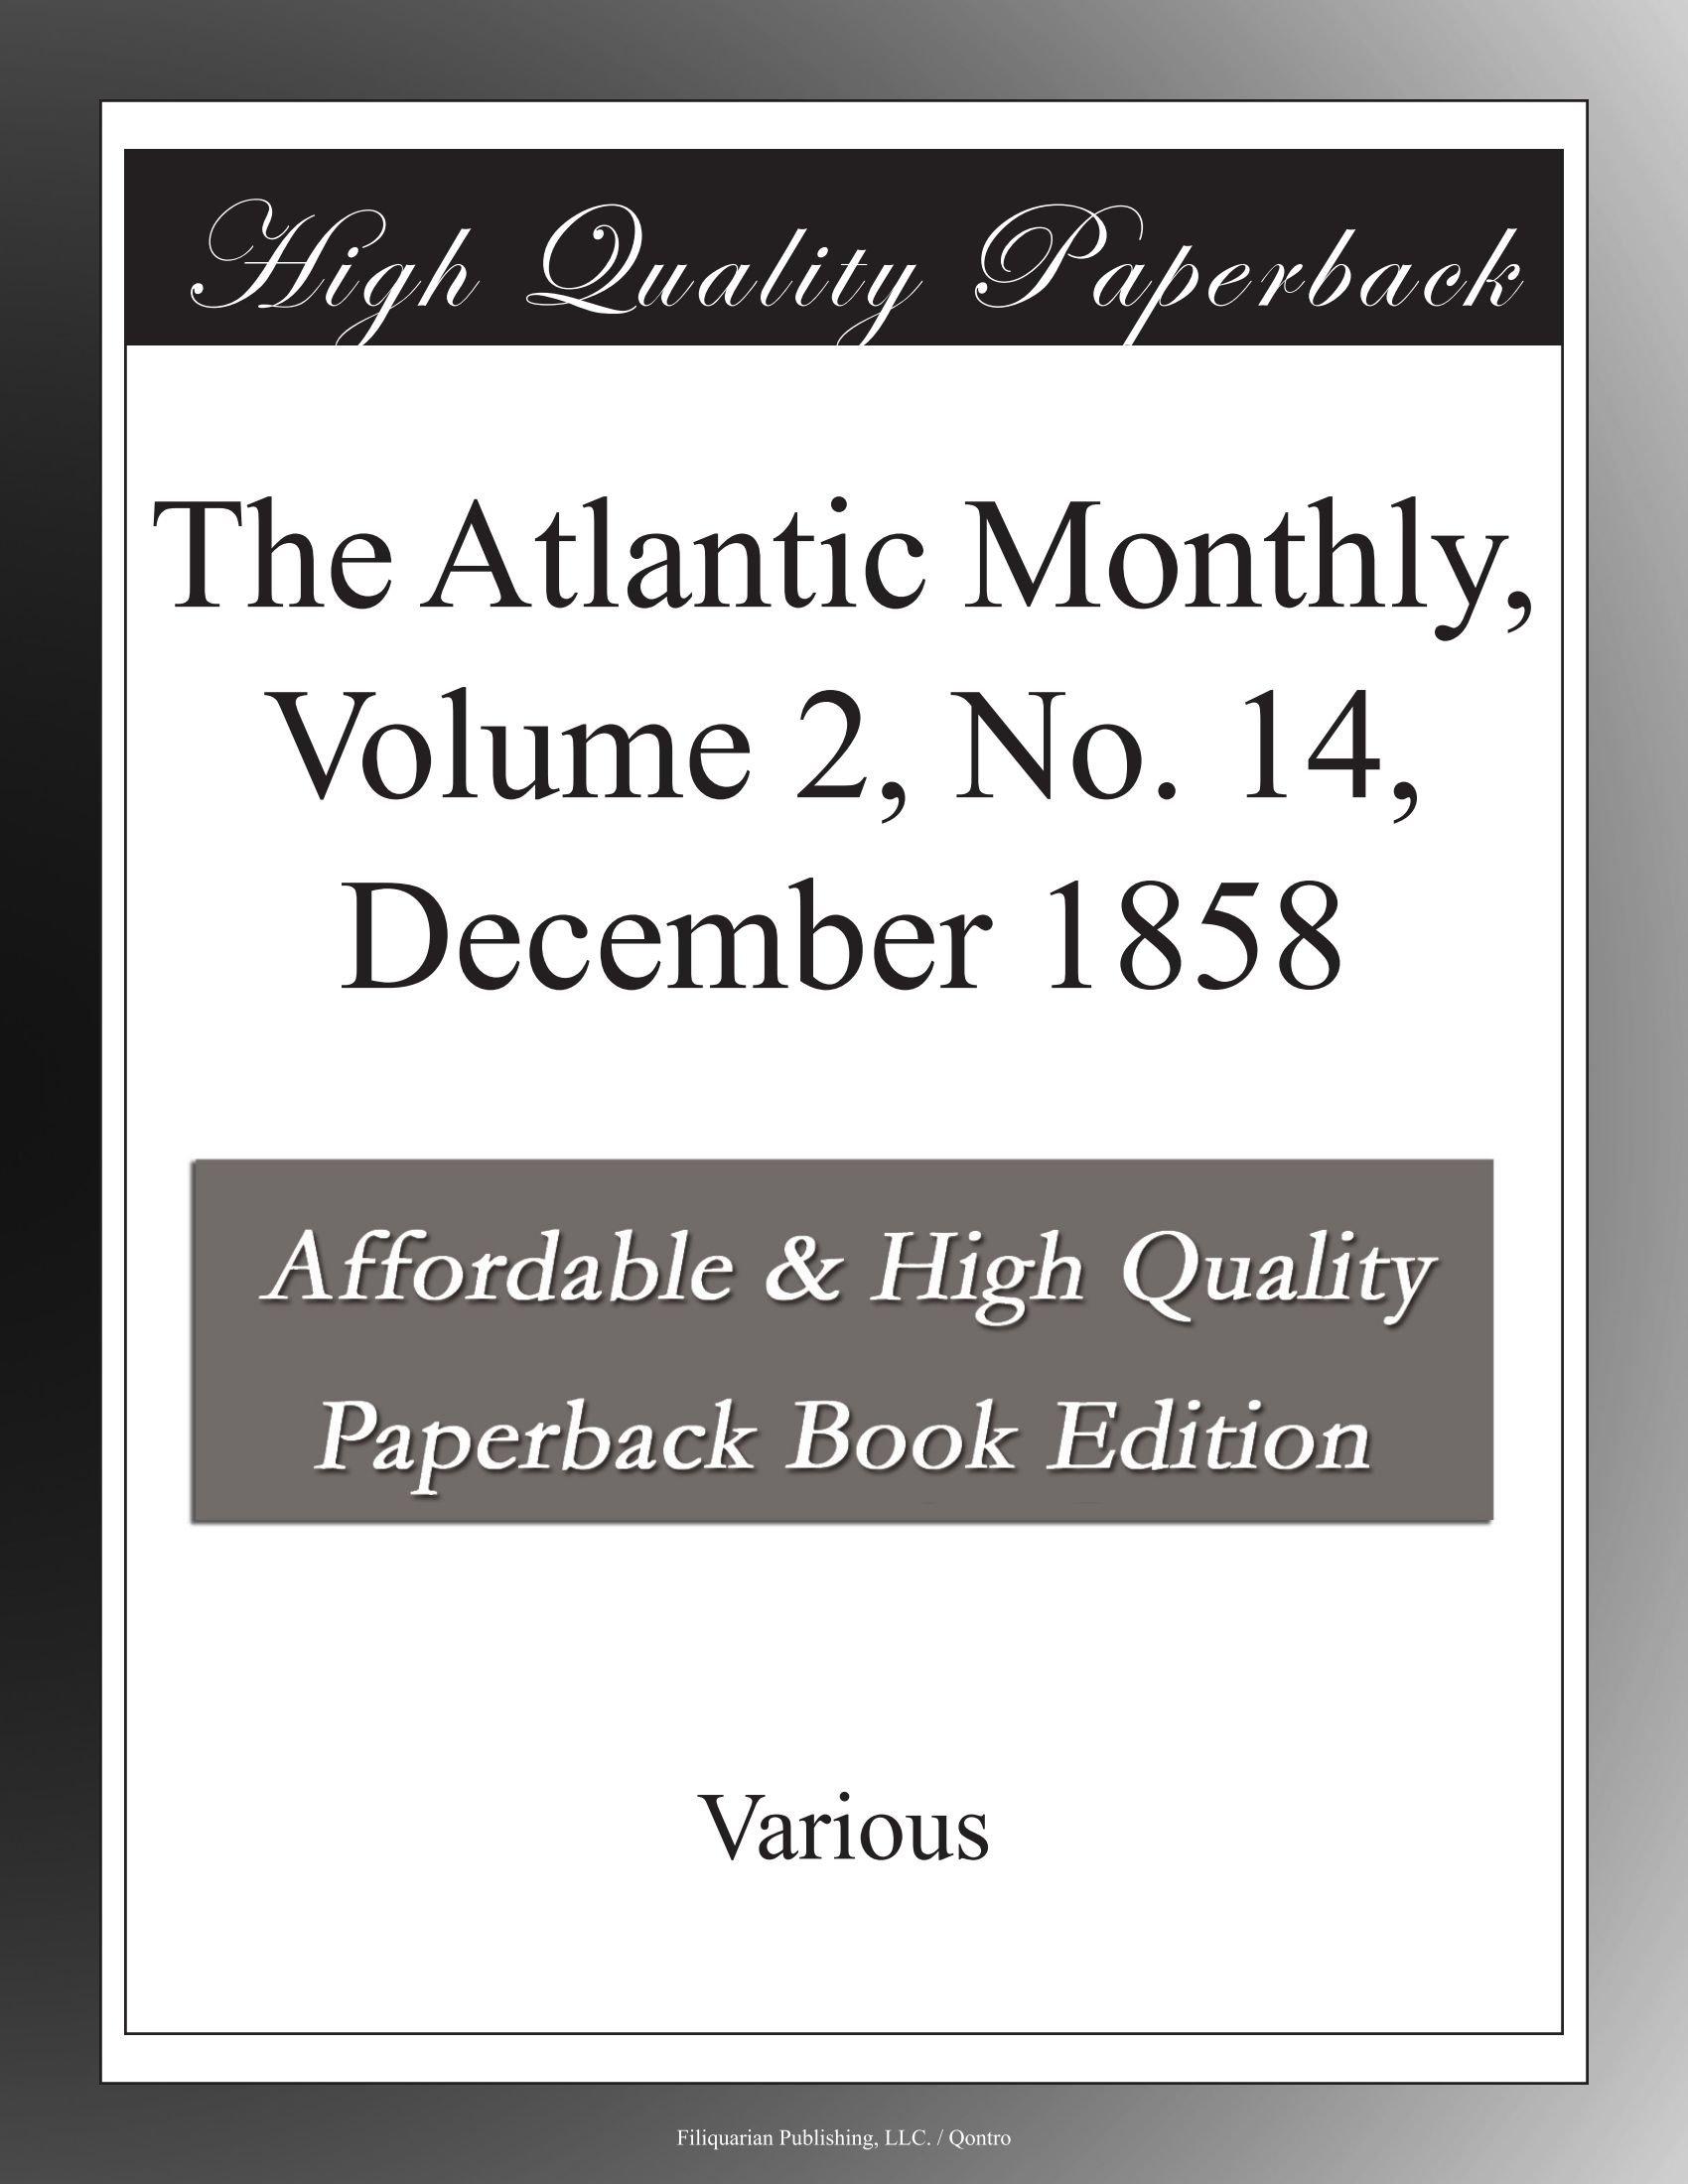 The Atlantic Monthly, Volume 2, No. 14, December 1858 PDF